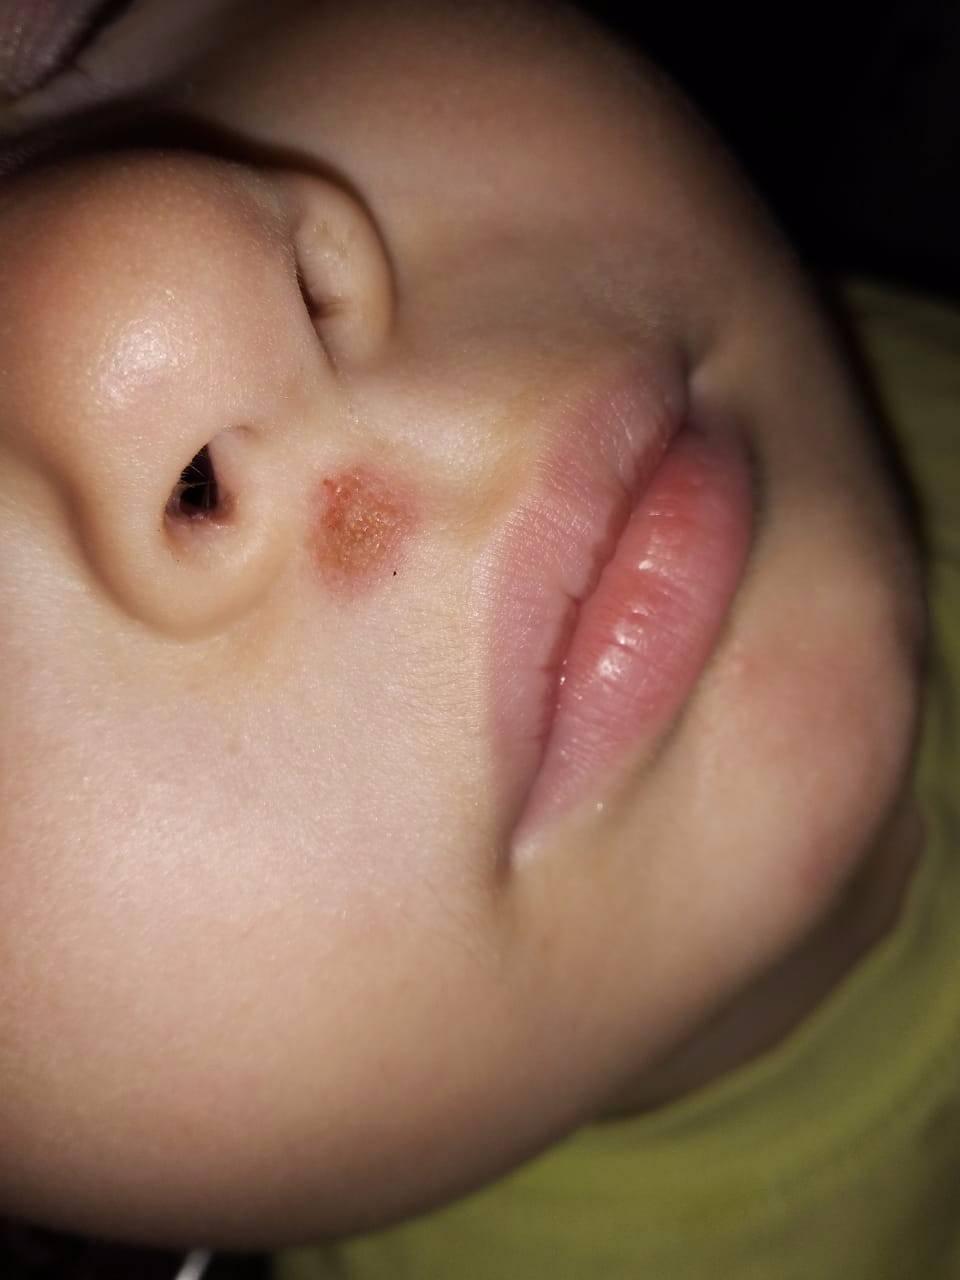 герпес на носу лечение в домашних условиях